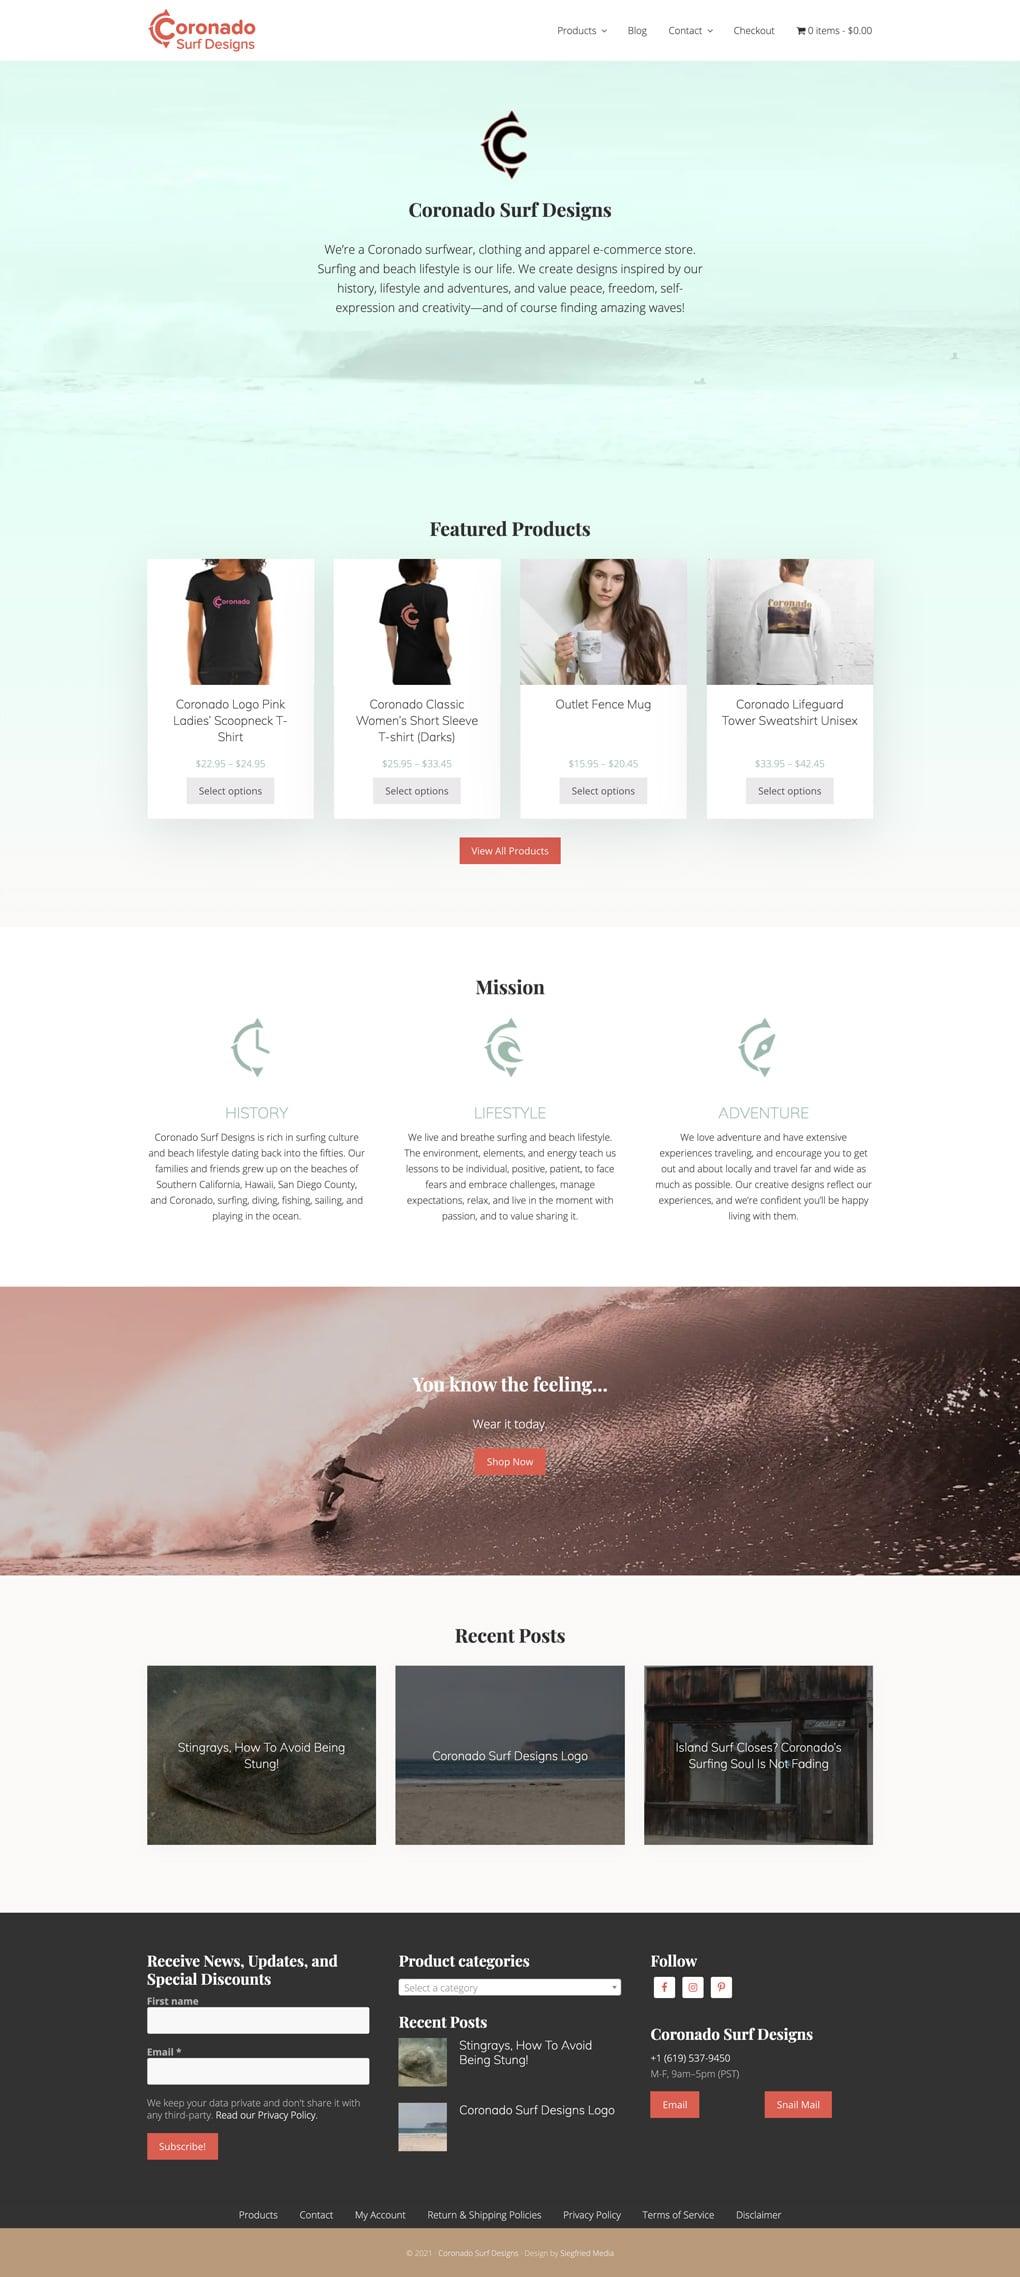 Coronado-Surf-Designs-1020w